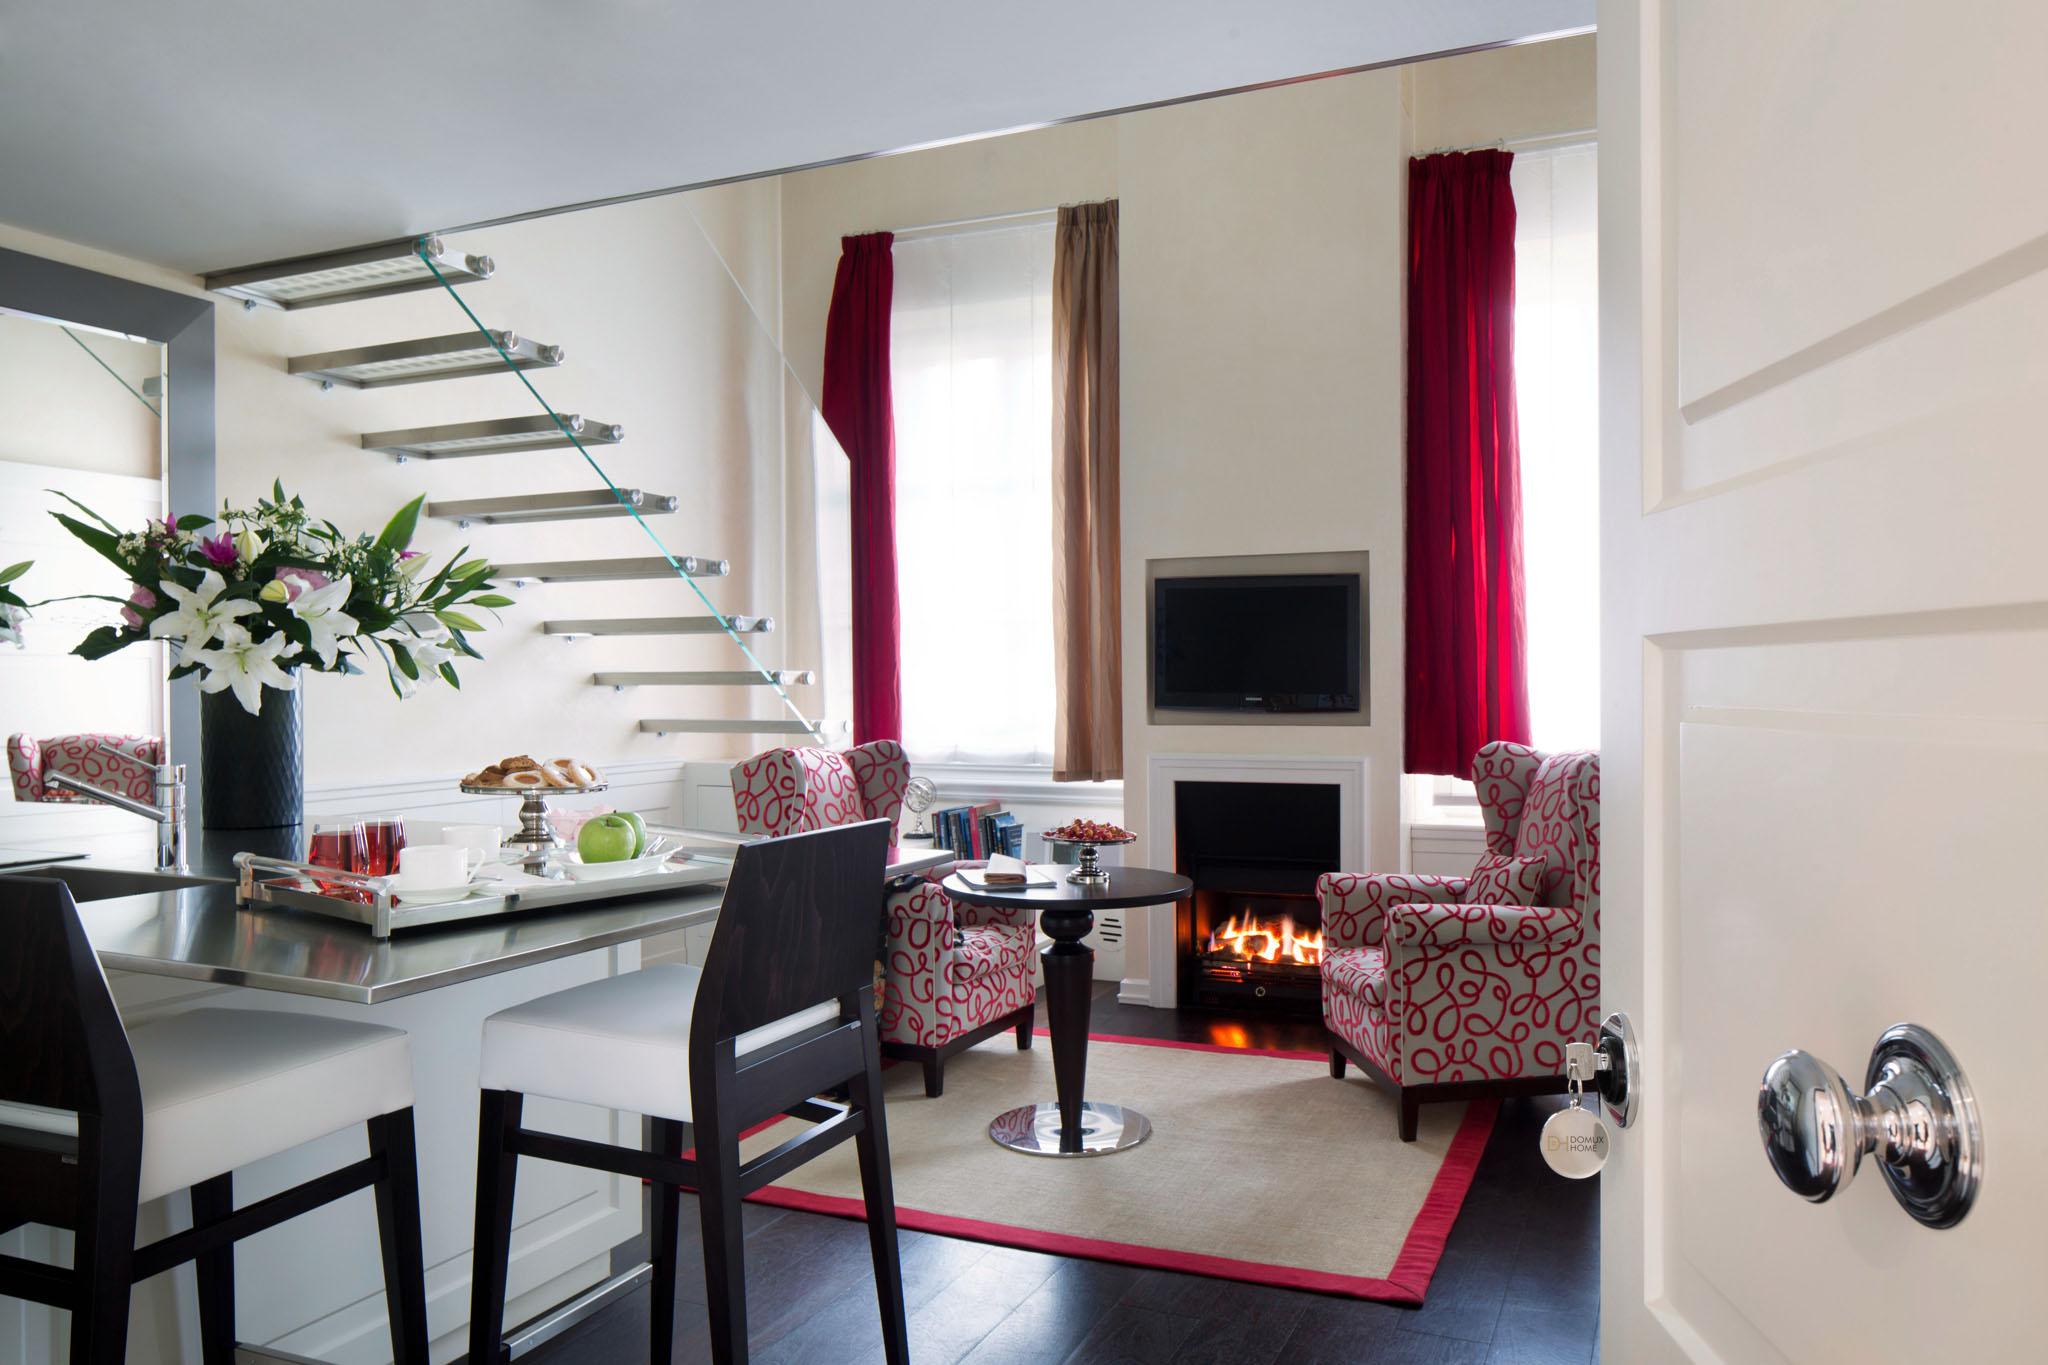 Domux home appartamenti di lusso a firenze ricasoli for Appartamenti design firenze